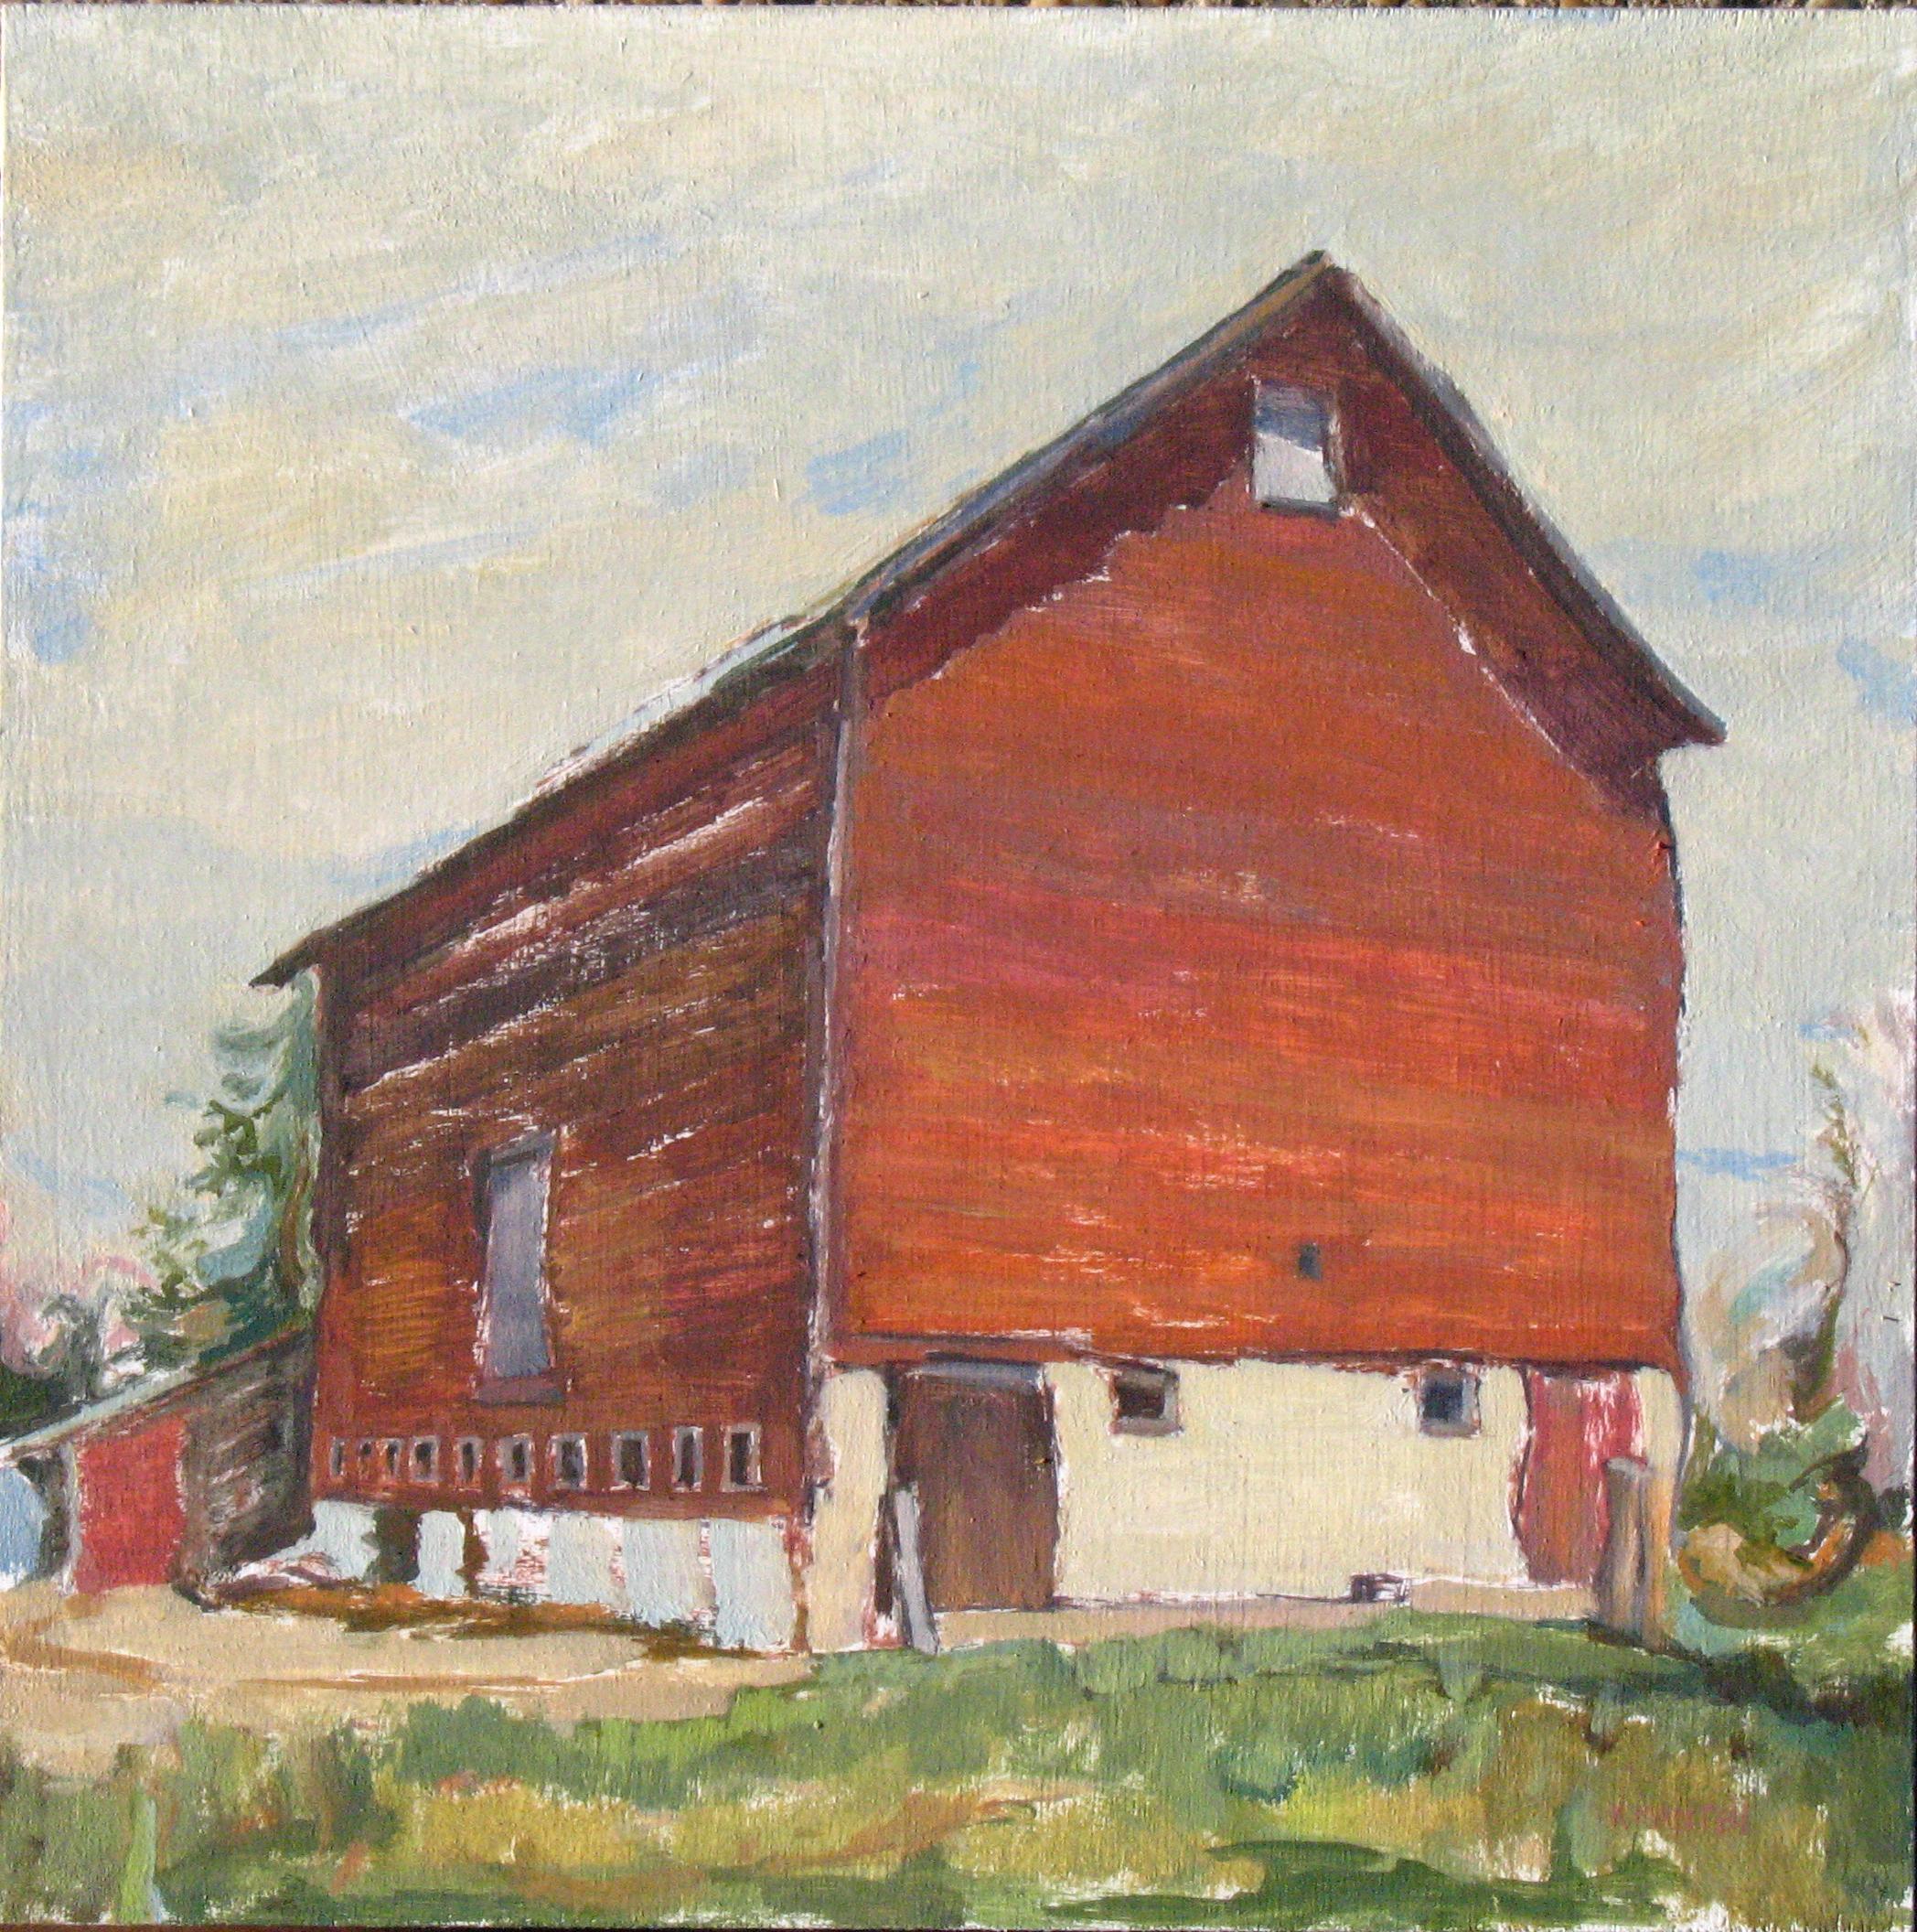 10x10 11 06 09 itsa barn.jpg